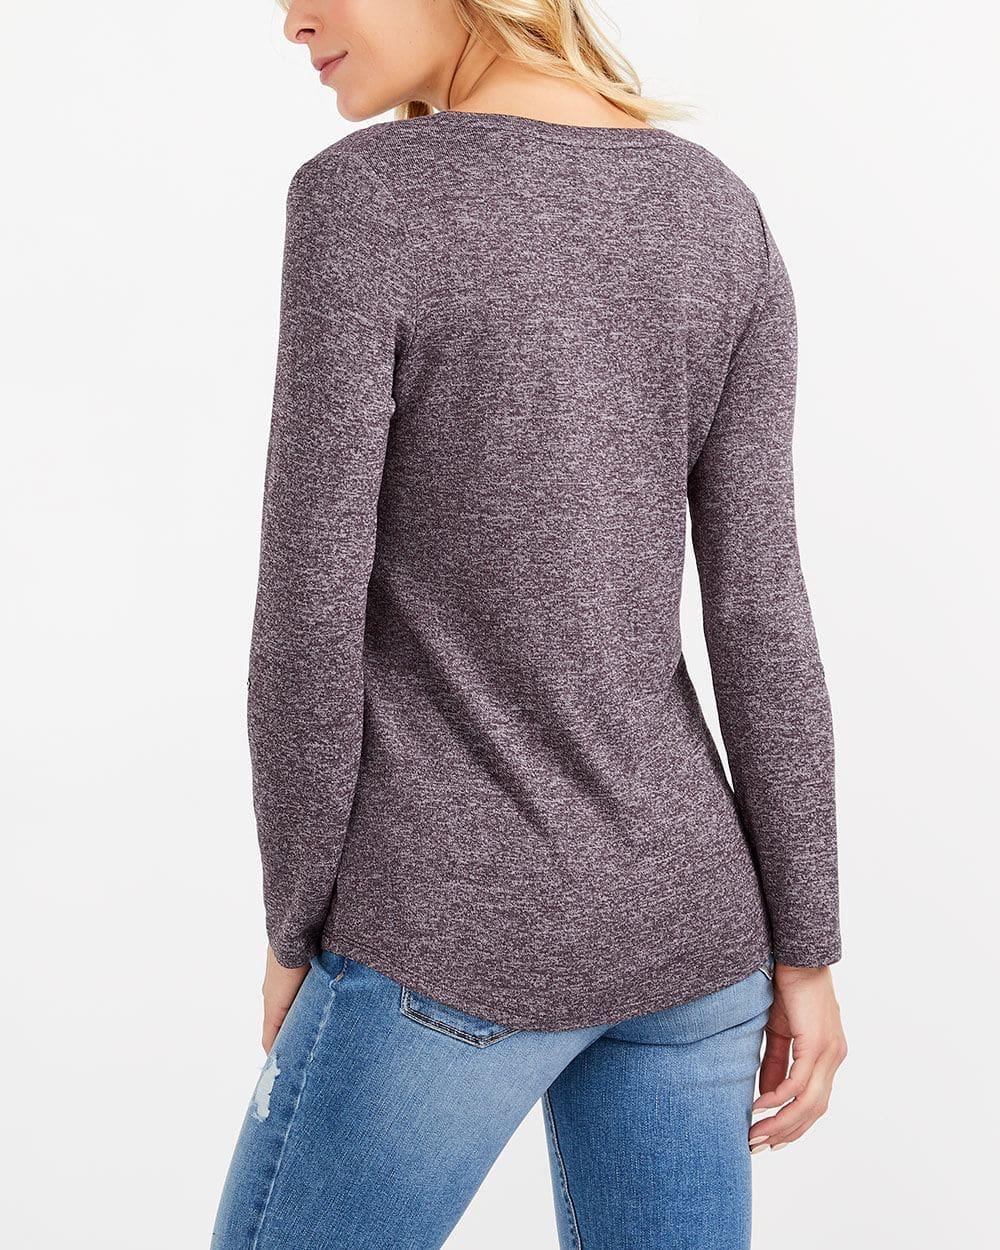 Adjustable Sleeve Solid Henley Top